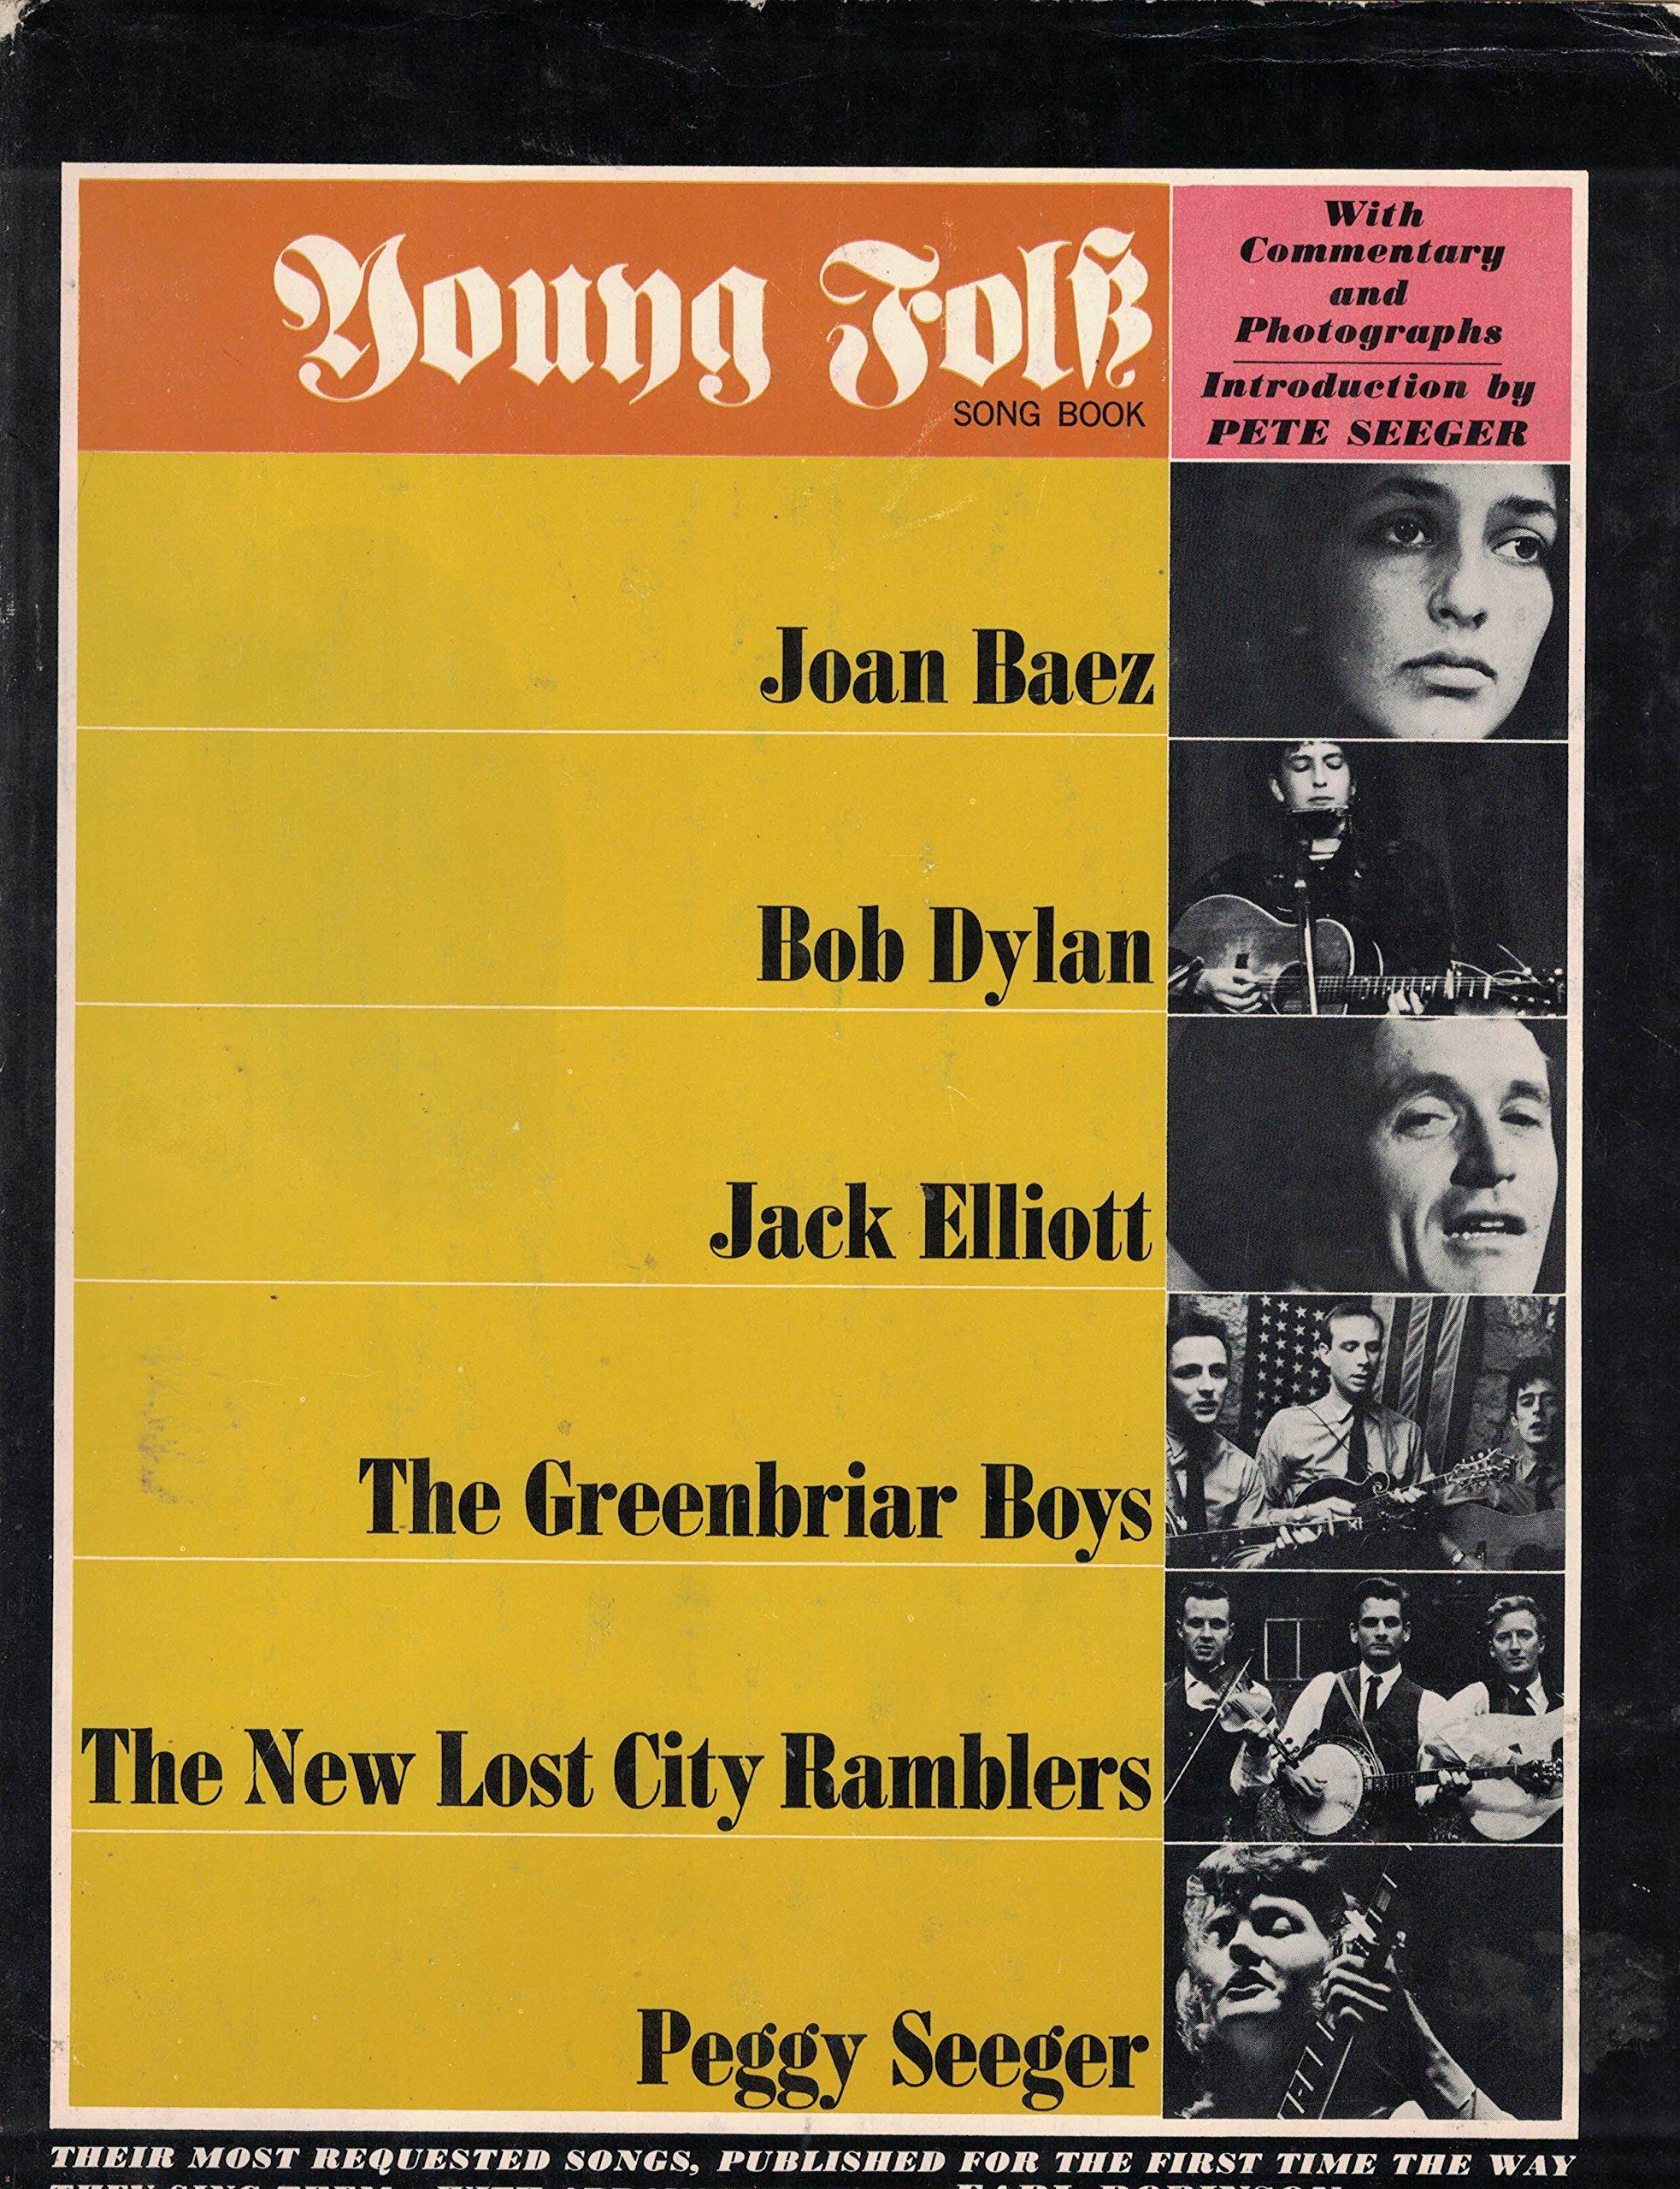 Young Folk Song Book: Joan Baez-Bob Dylan-Jack Elliott-the